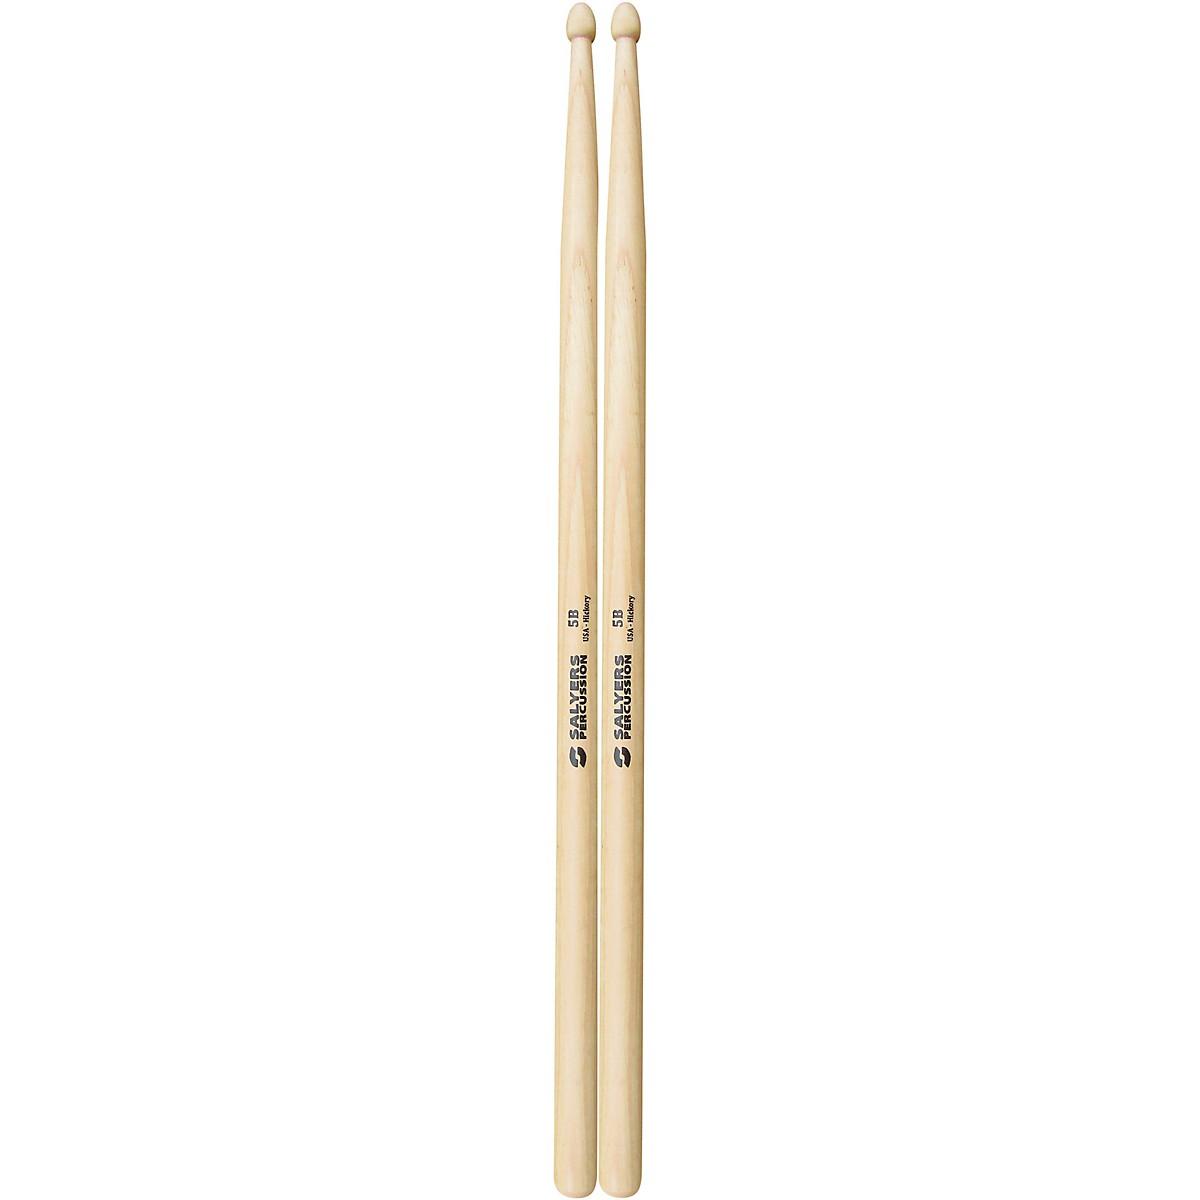 Salyers Percussion Combo Drum Sticks